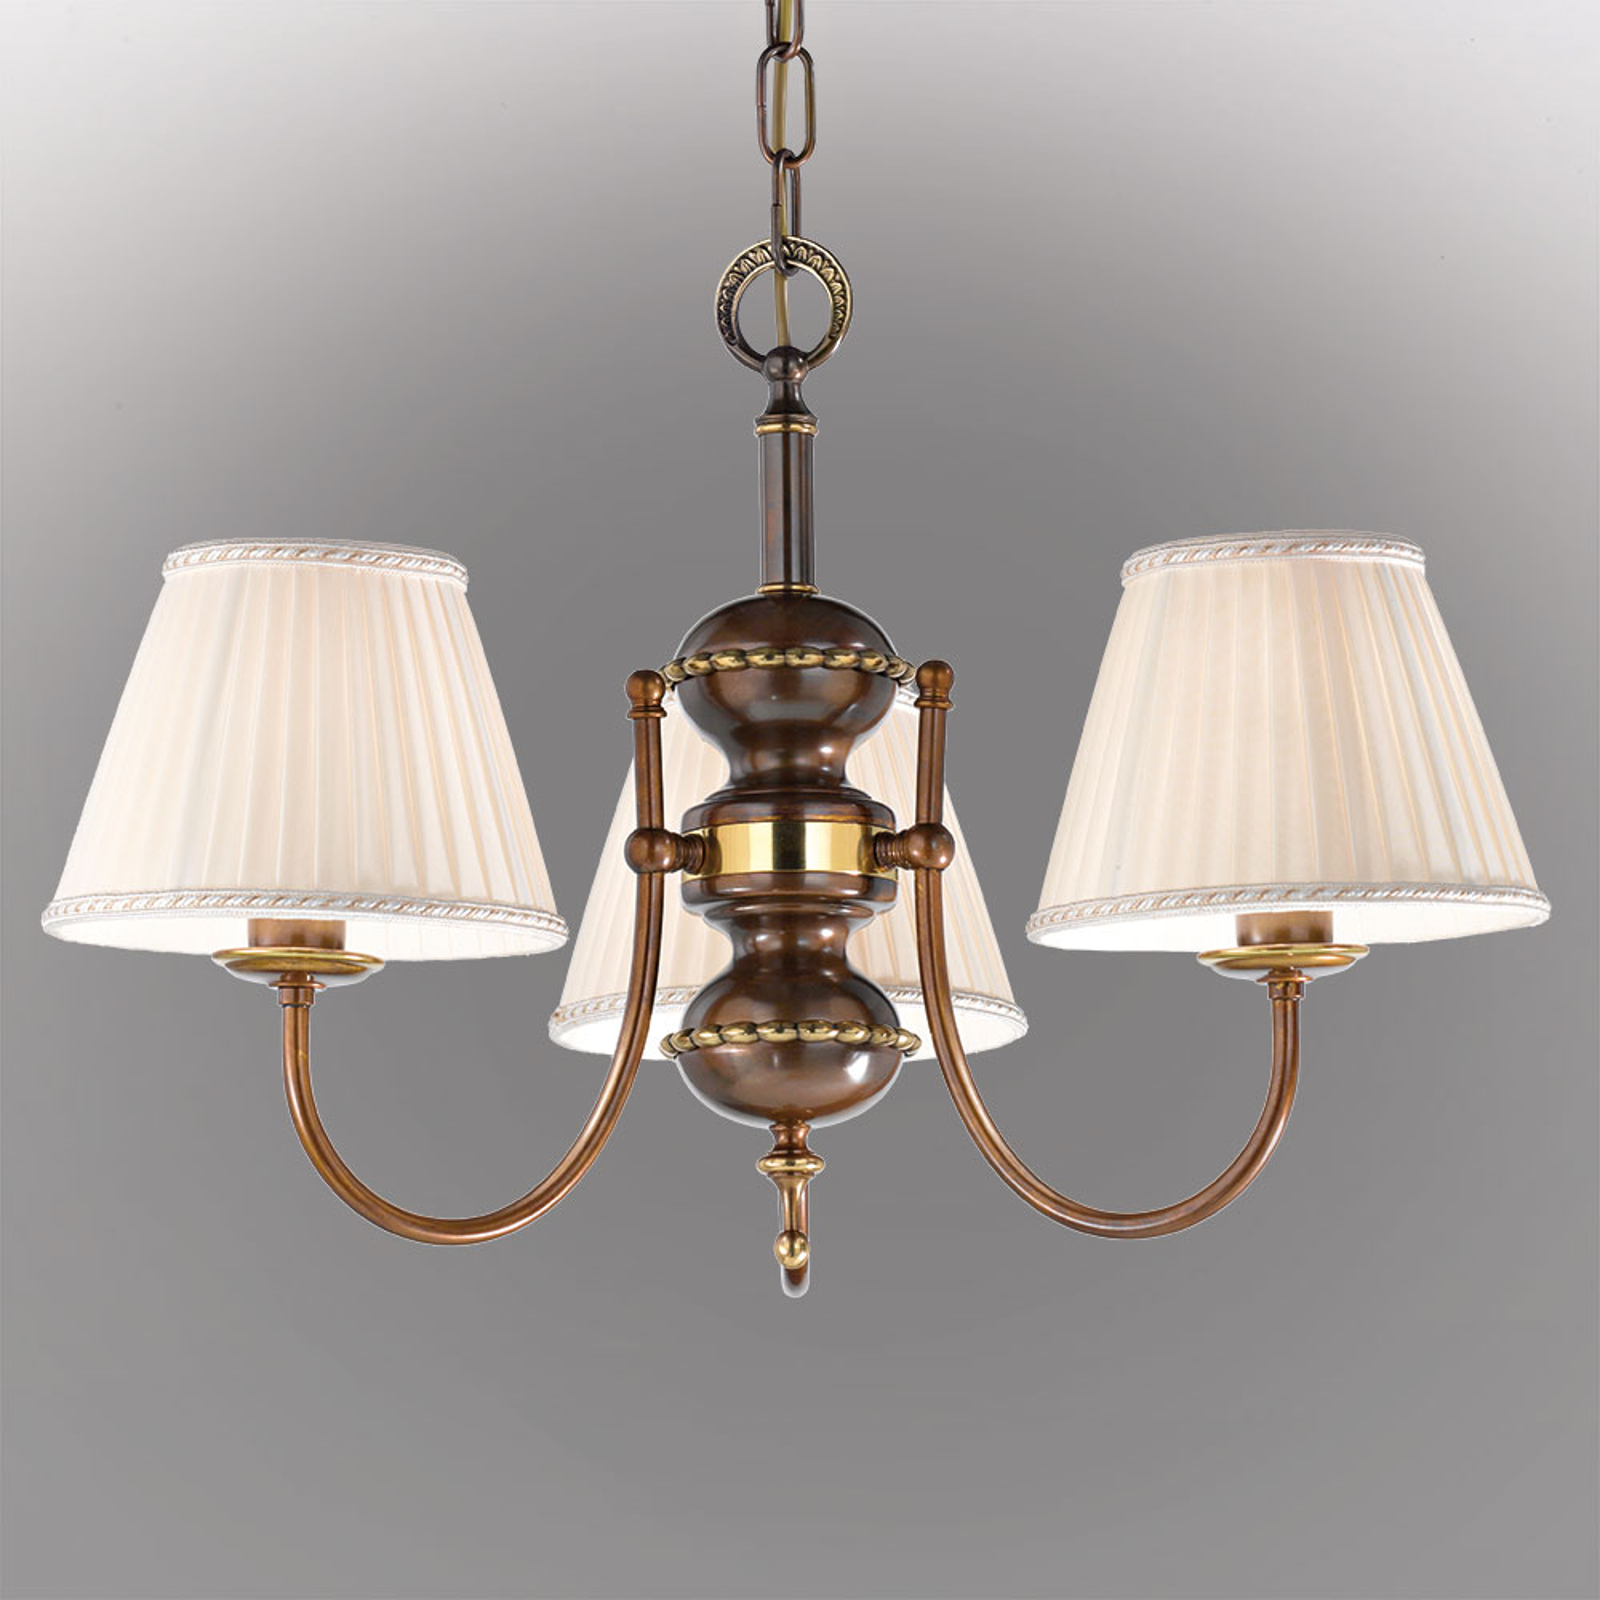 Antiek ogende hanglamp Classic, 3-lichts